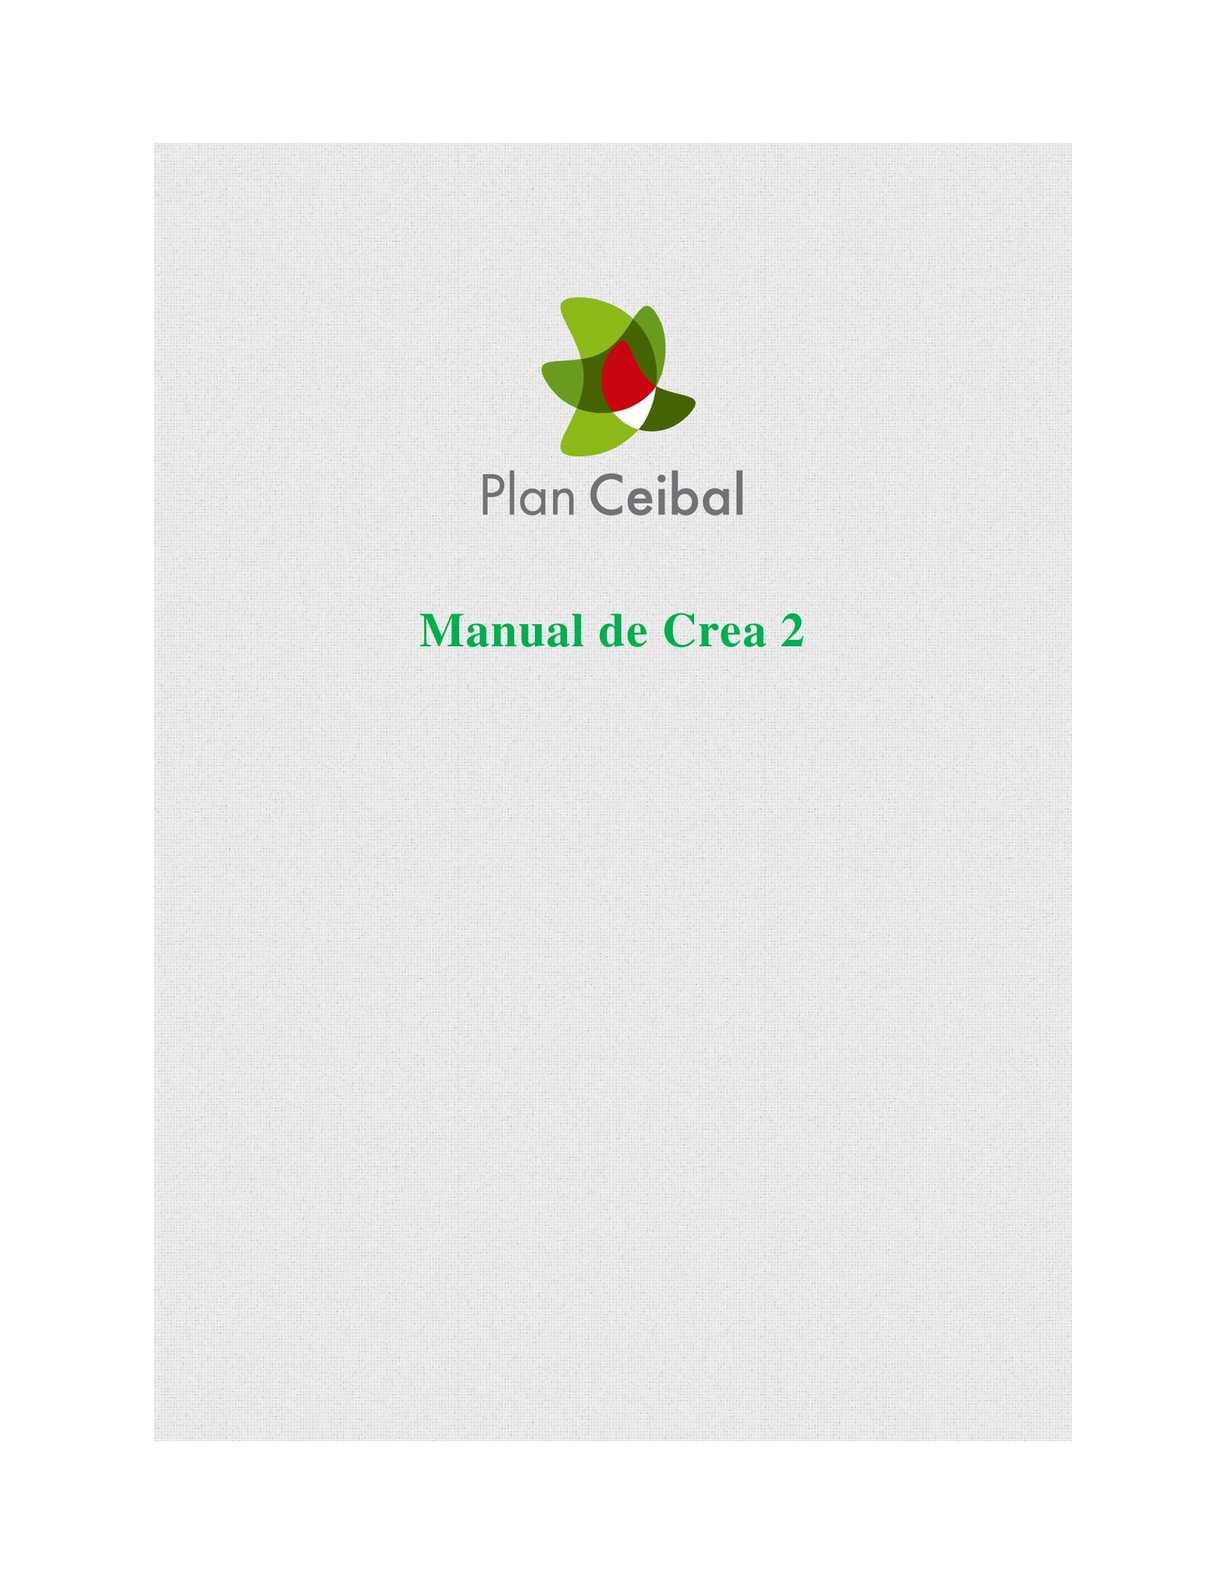 Calaméo - Manual Crea 2 Ceibal